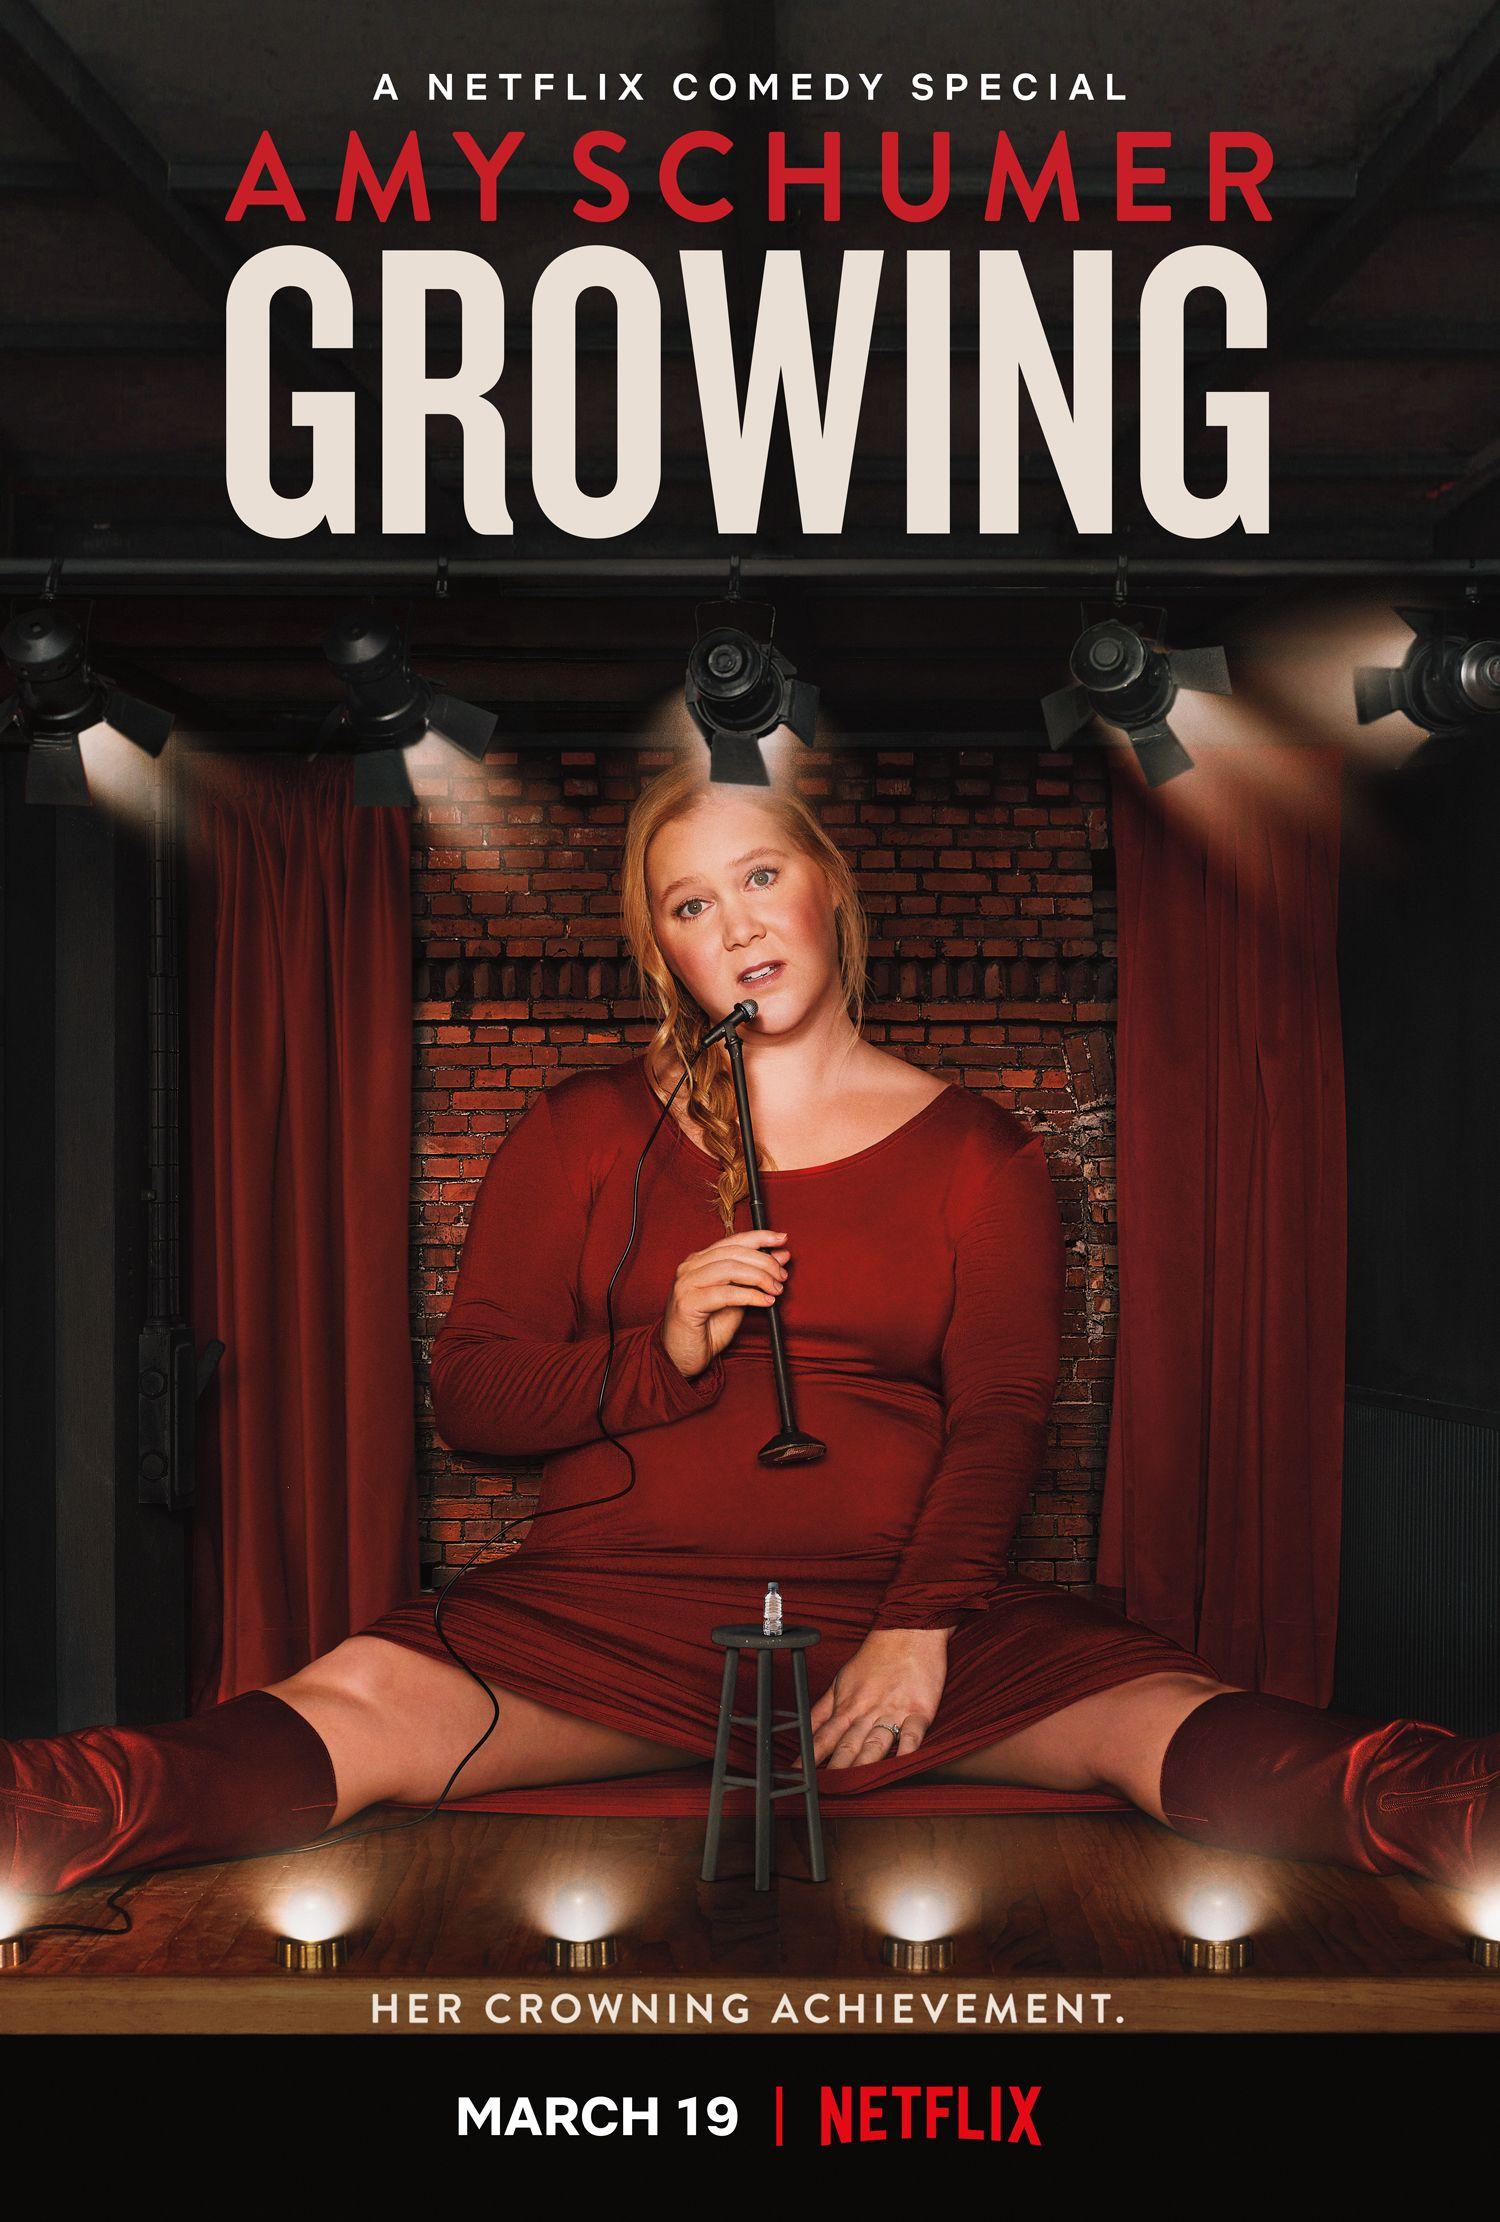 Amy Schumer Nude Scene amy schumer netflix special trailer reveals growing   collider